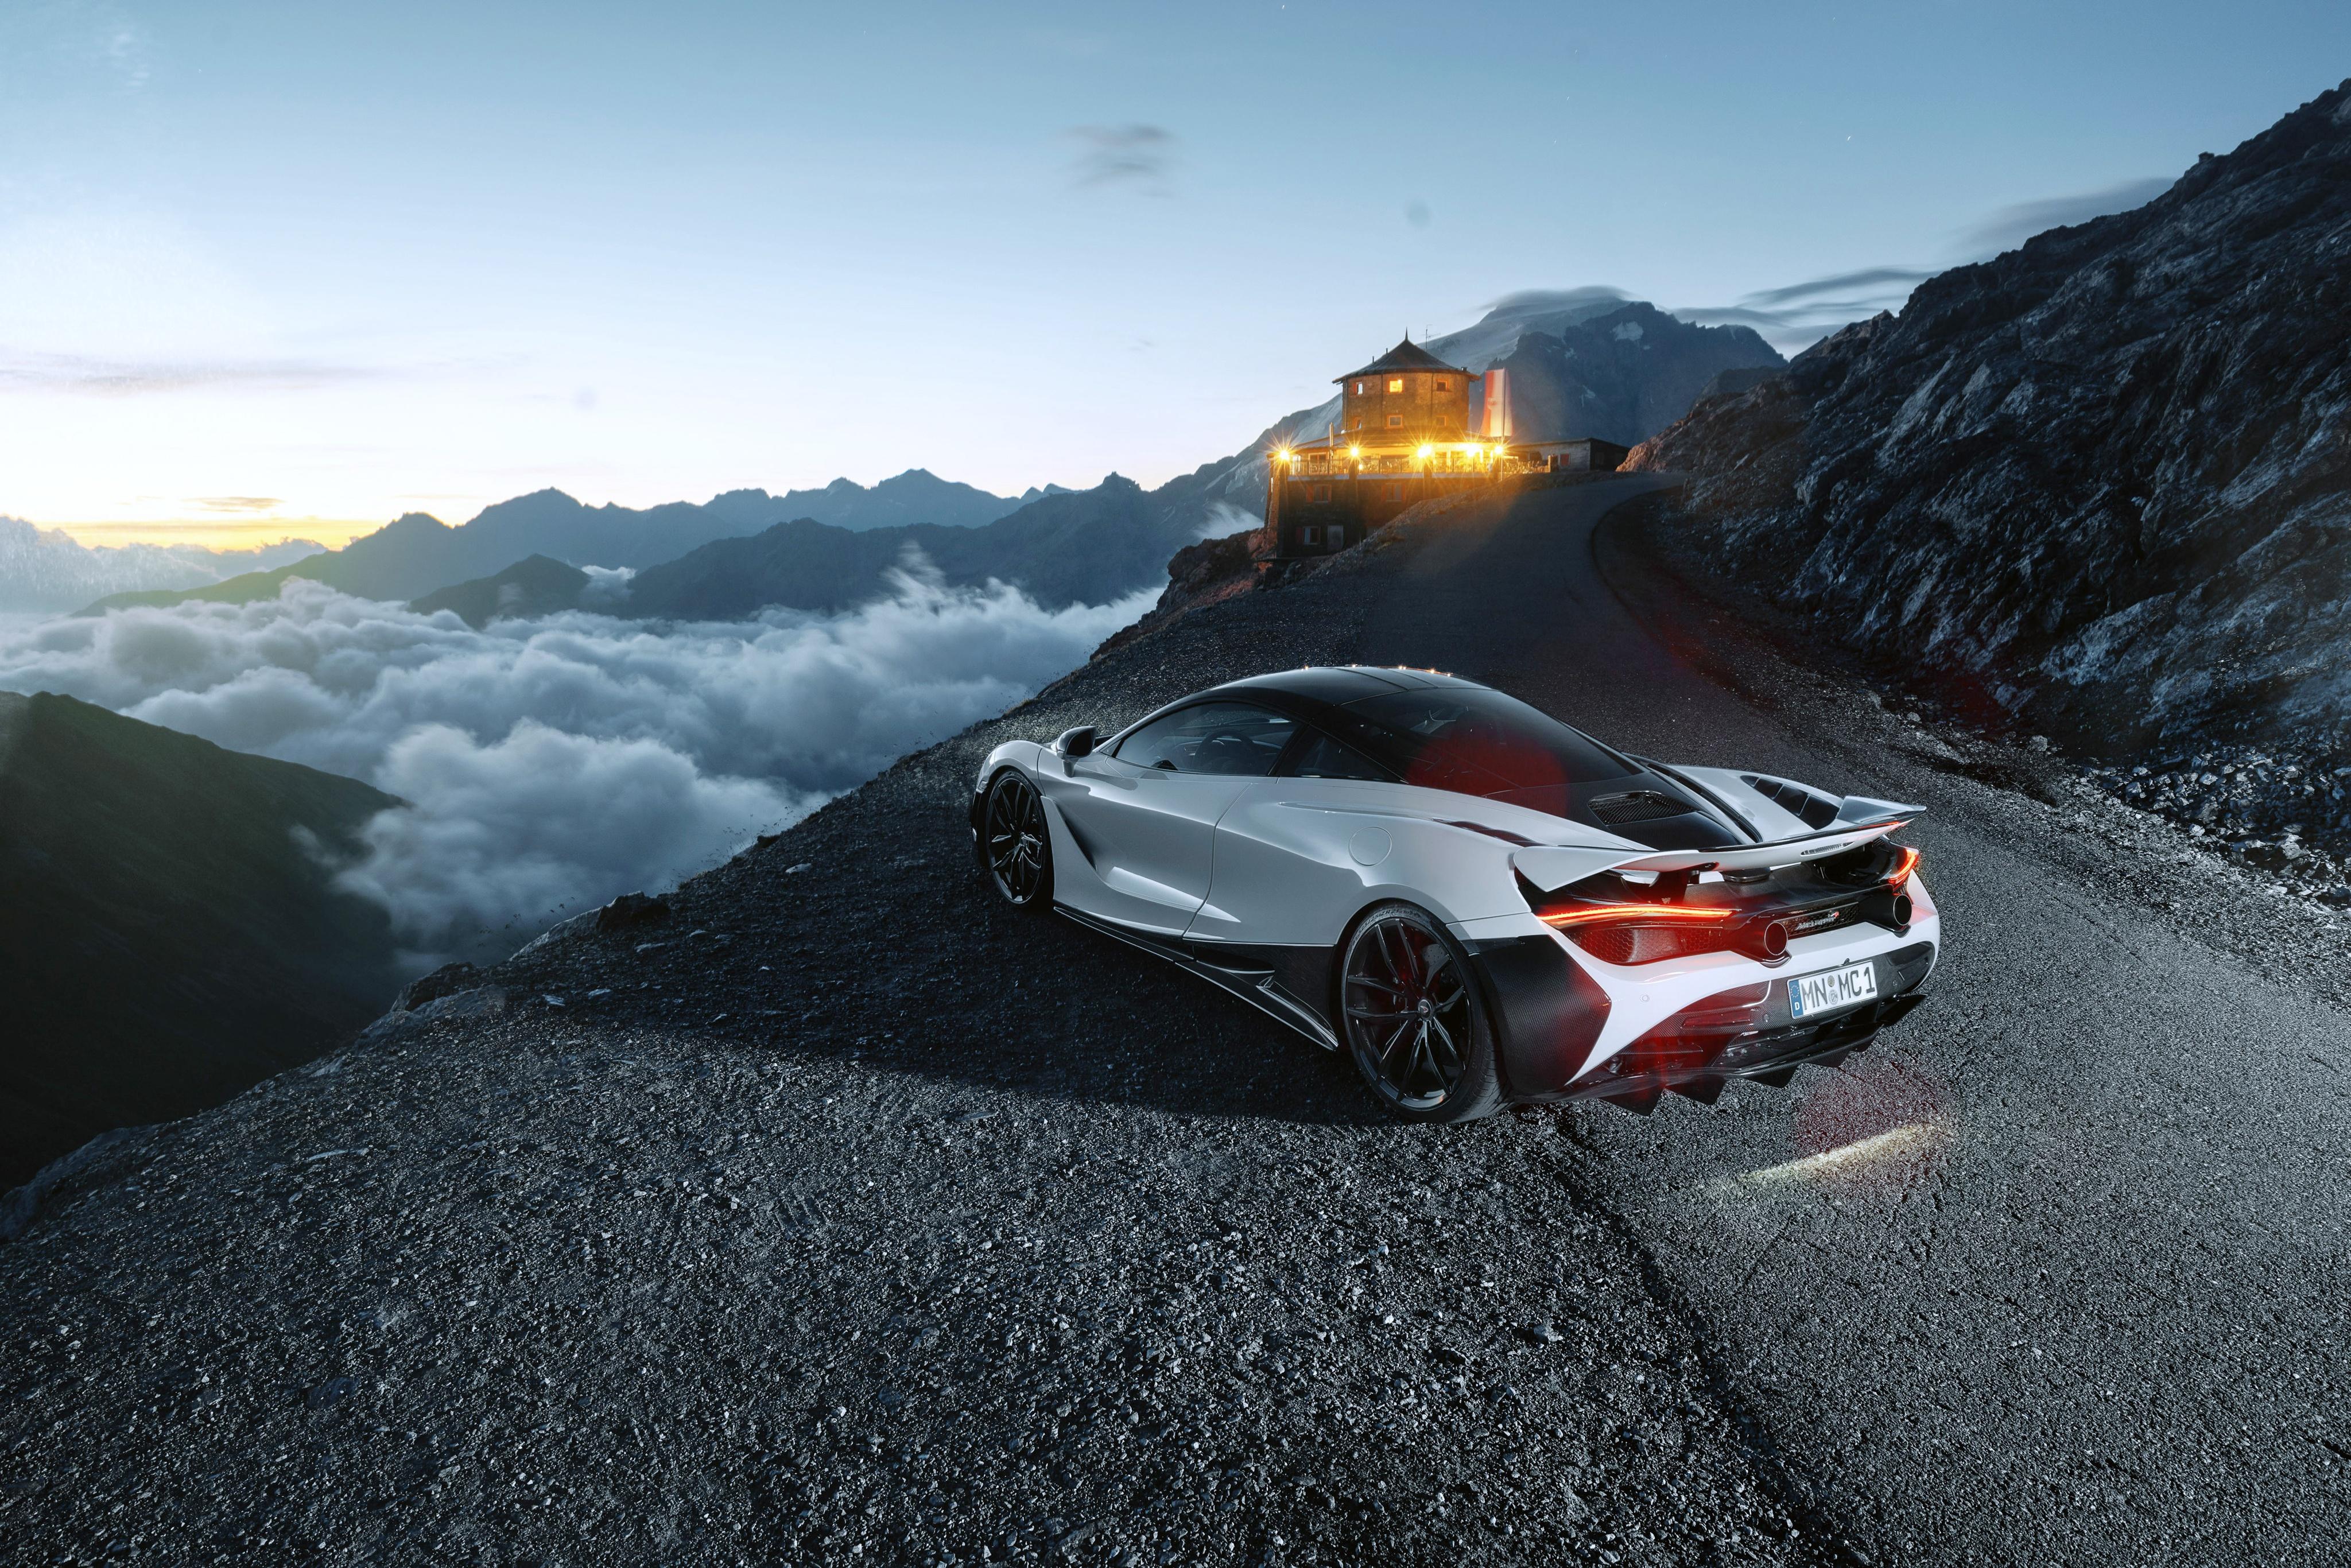 McLaren 720S 4k Ultra HD Wallpaper | Background Image ...